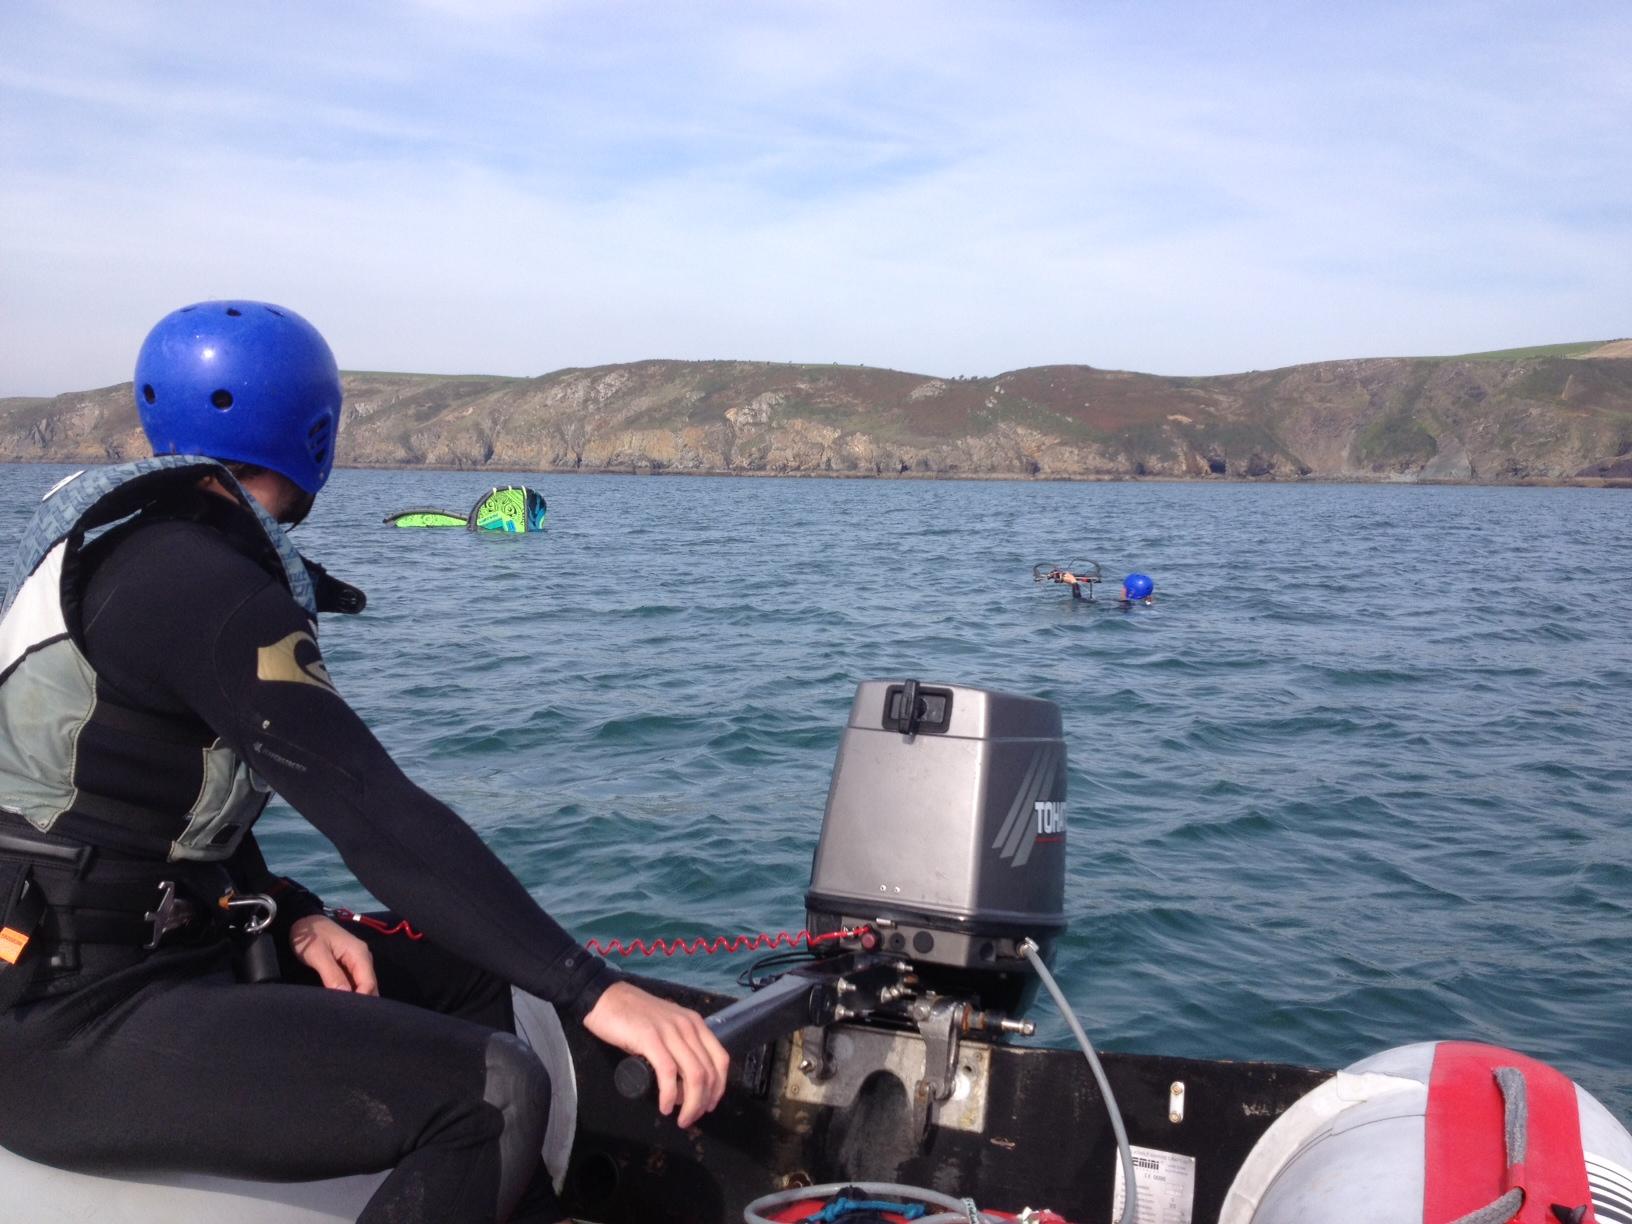 RYA Powerboat Courses 3